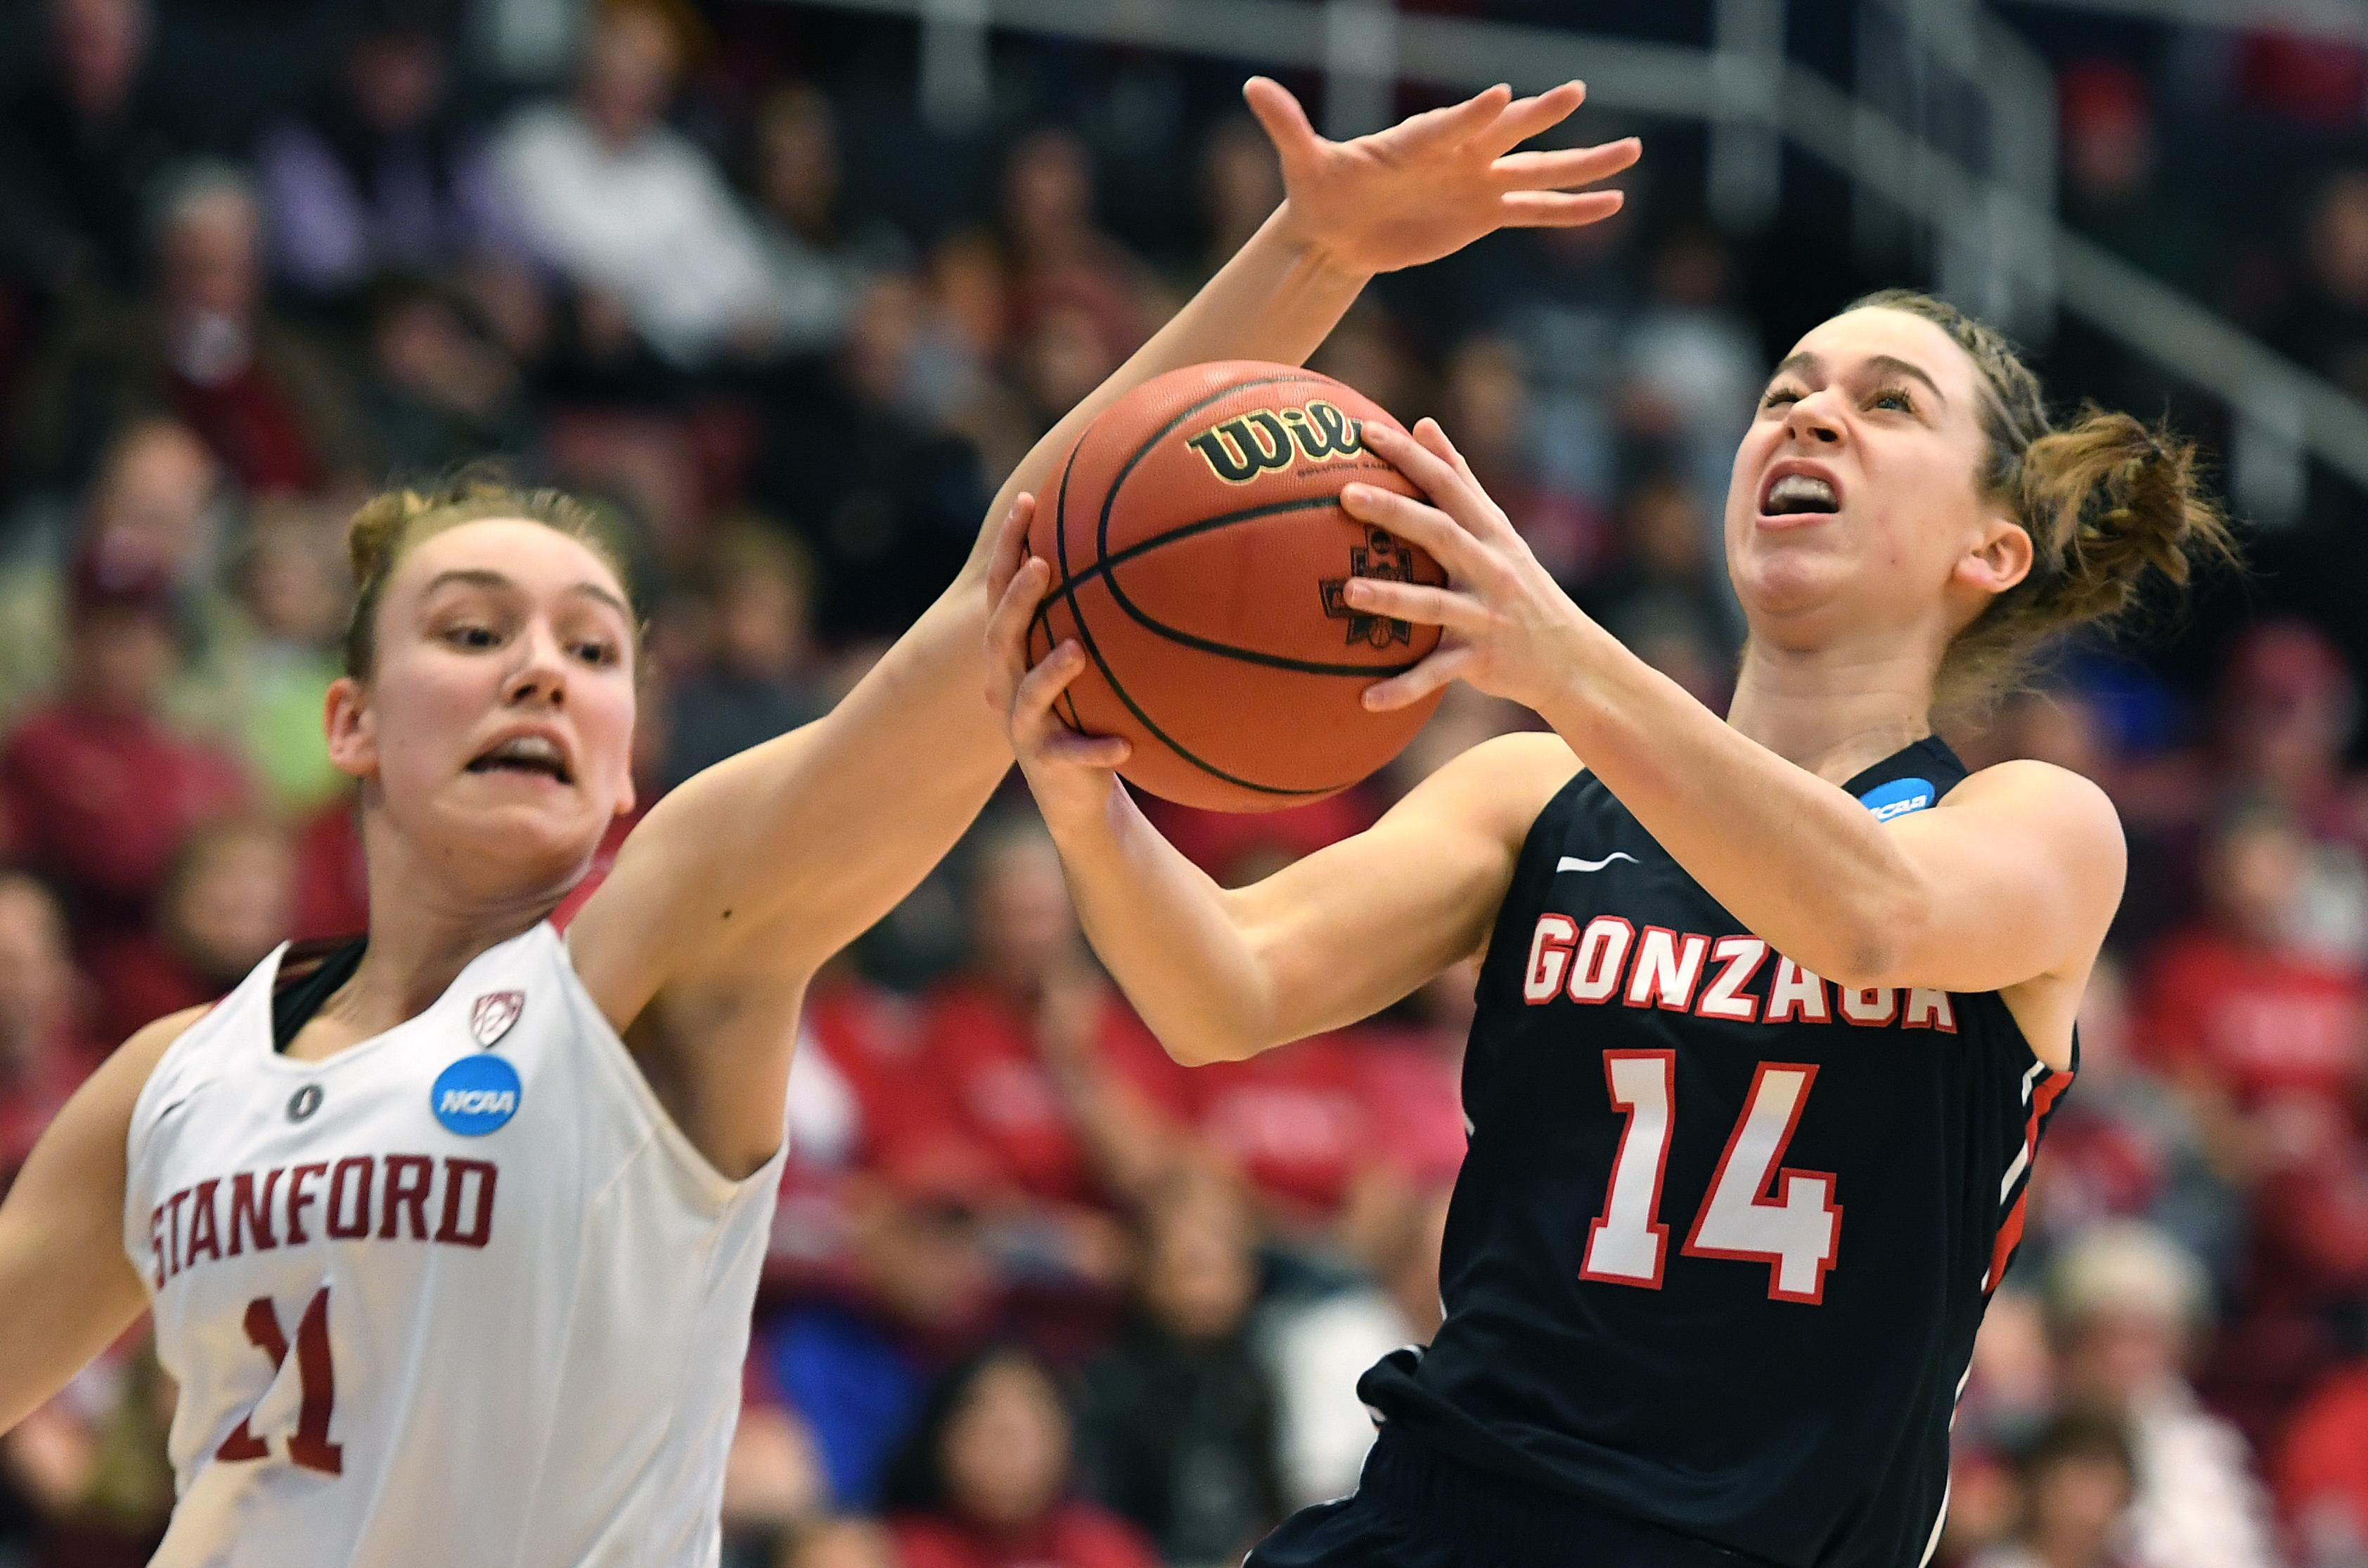 innovative design 23387 421f9 Gonzaga guard Emma Stach (14) heads to the basket as Stanford forward  Alanna Smith